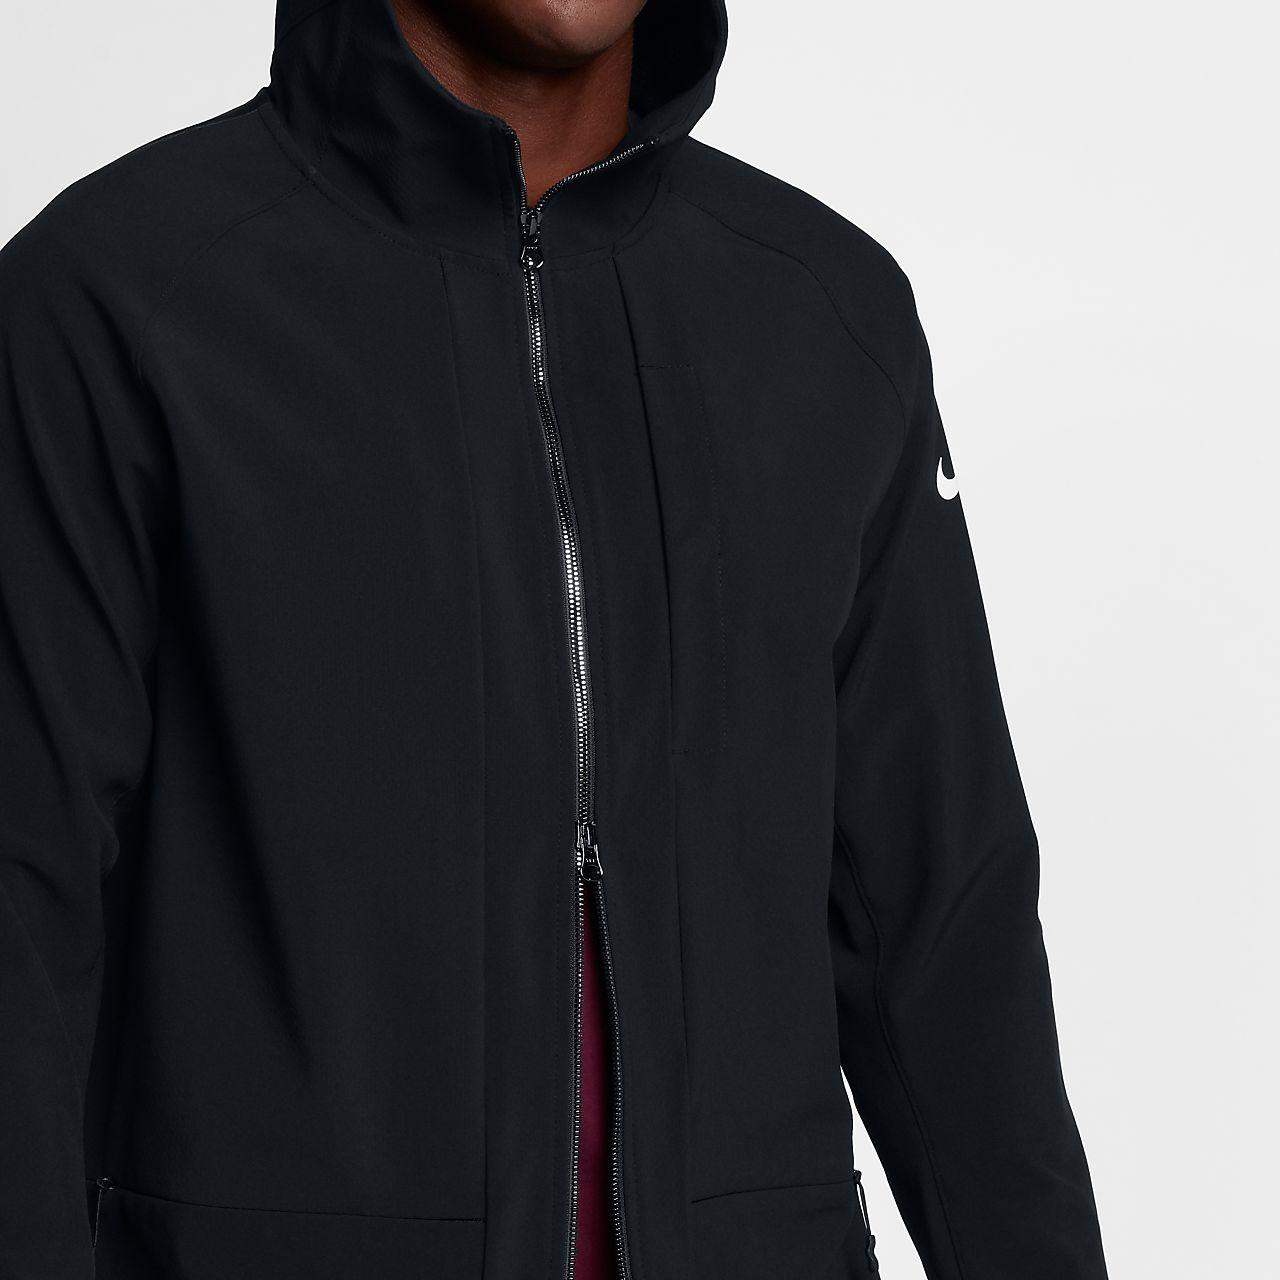 Nike Lebron Performance Men's Jacket